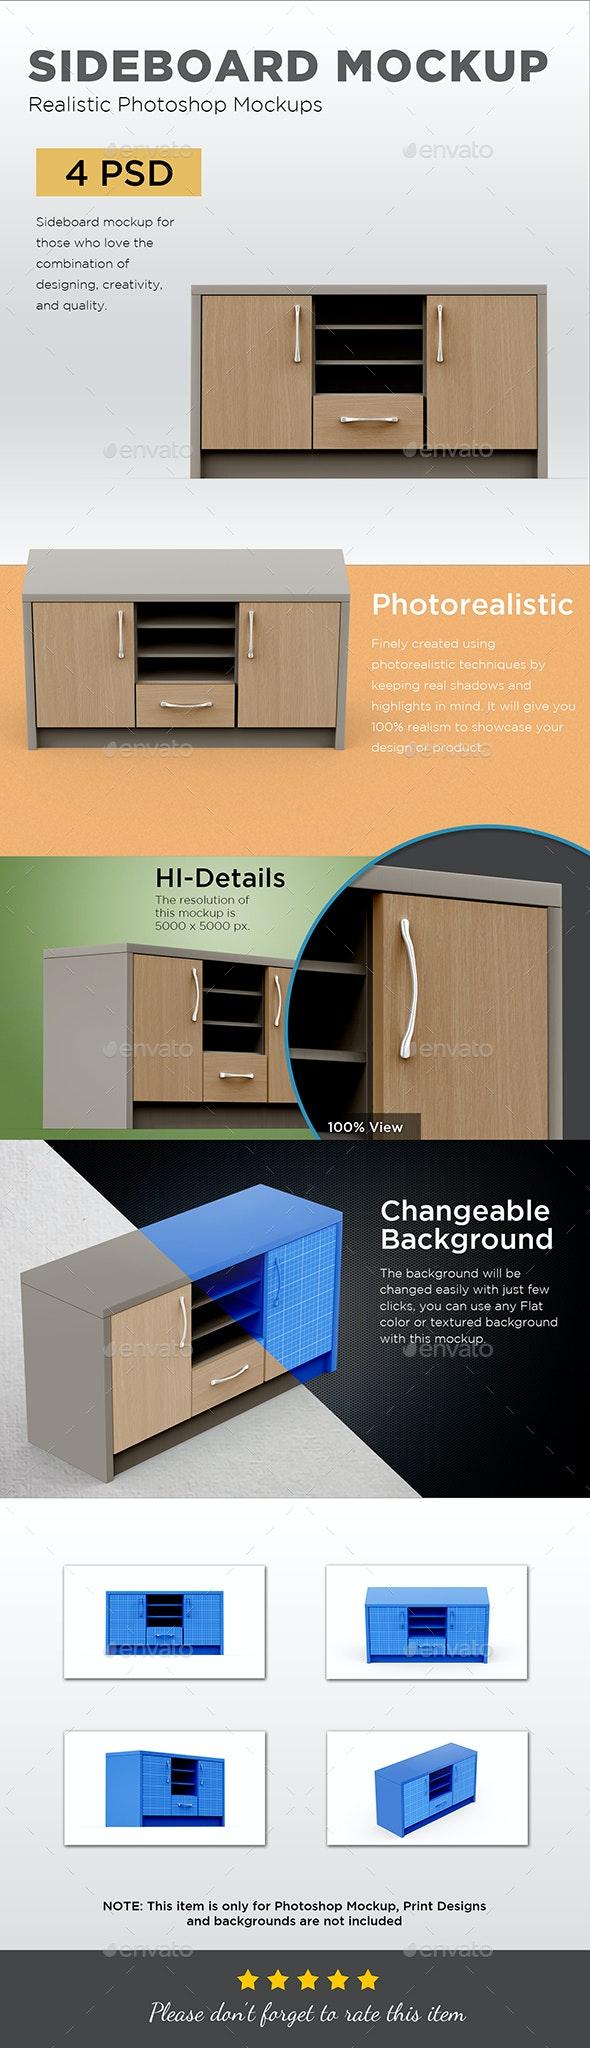 Sideboard Mockup - Displays Product Mock-Ups